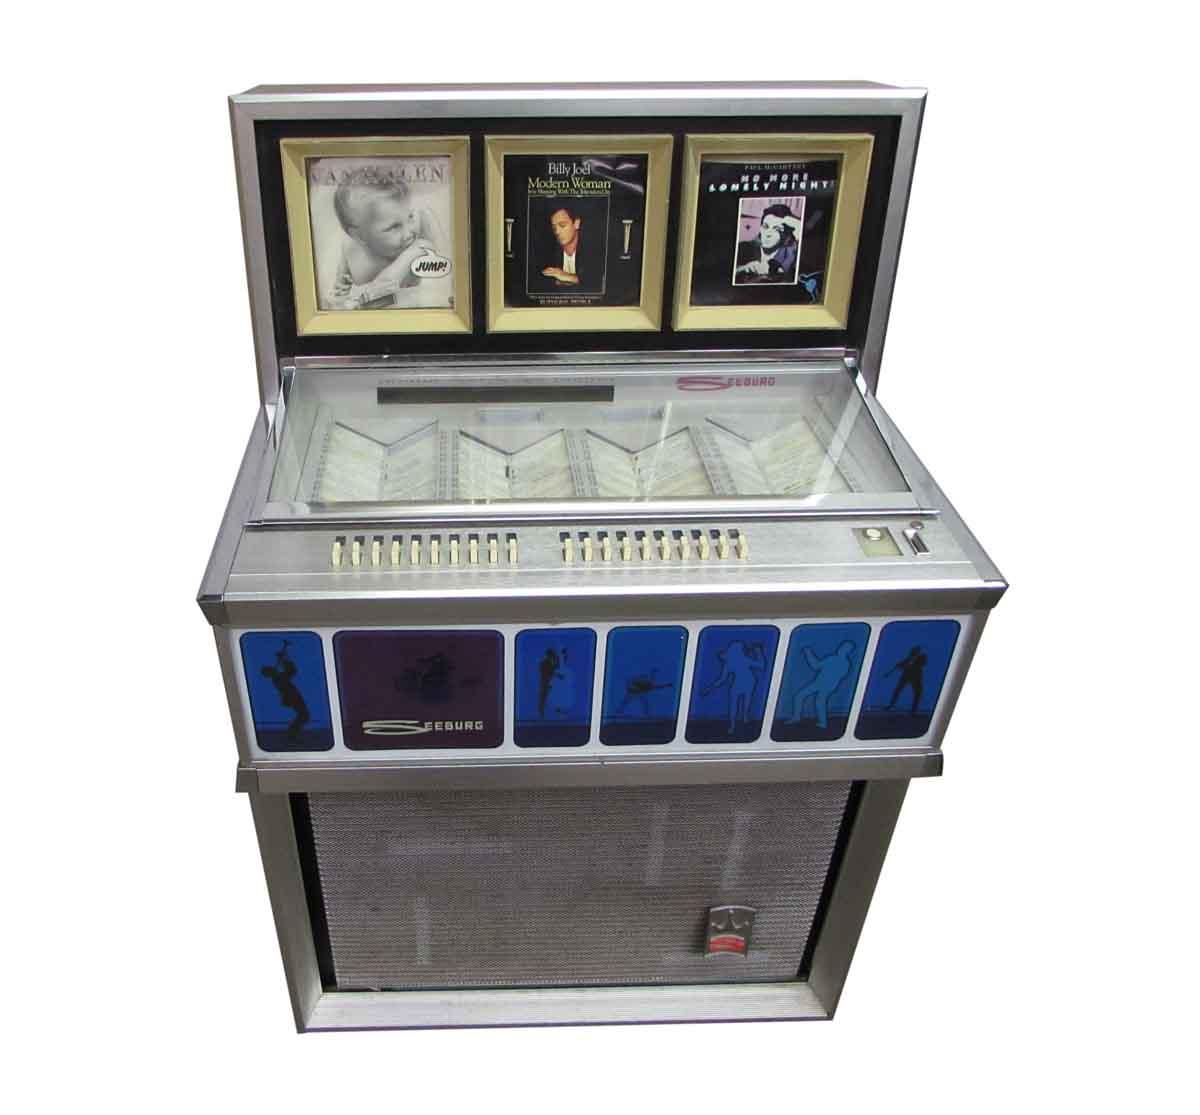 1967 seeburg jukebox model s100 olde good things. Black Bedroom Furniture Sets. Home Design Ideas